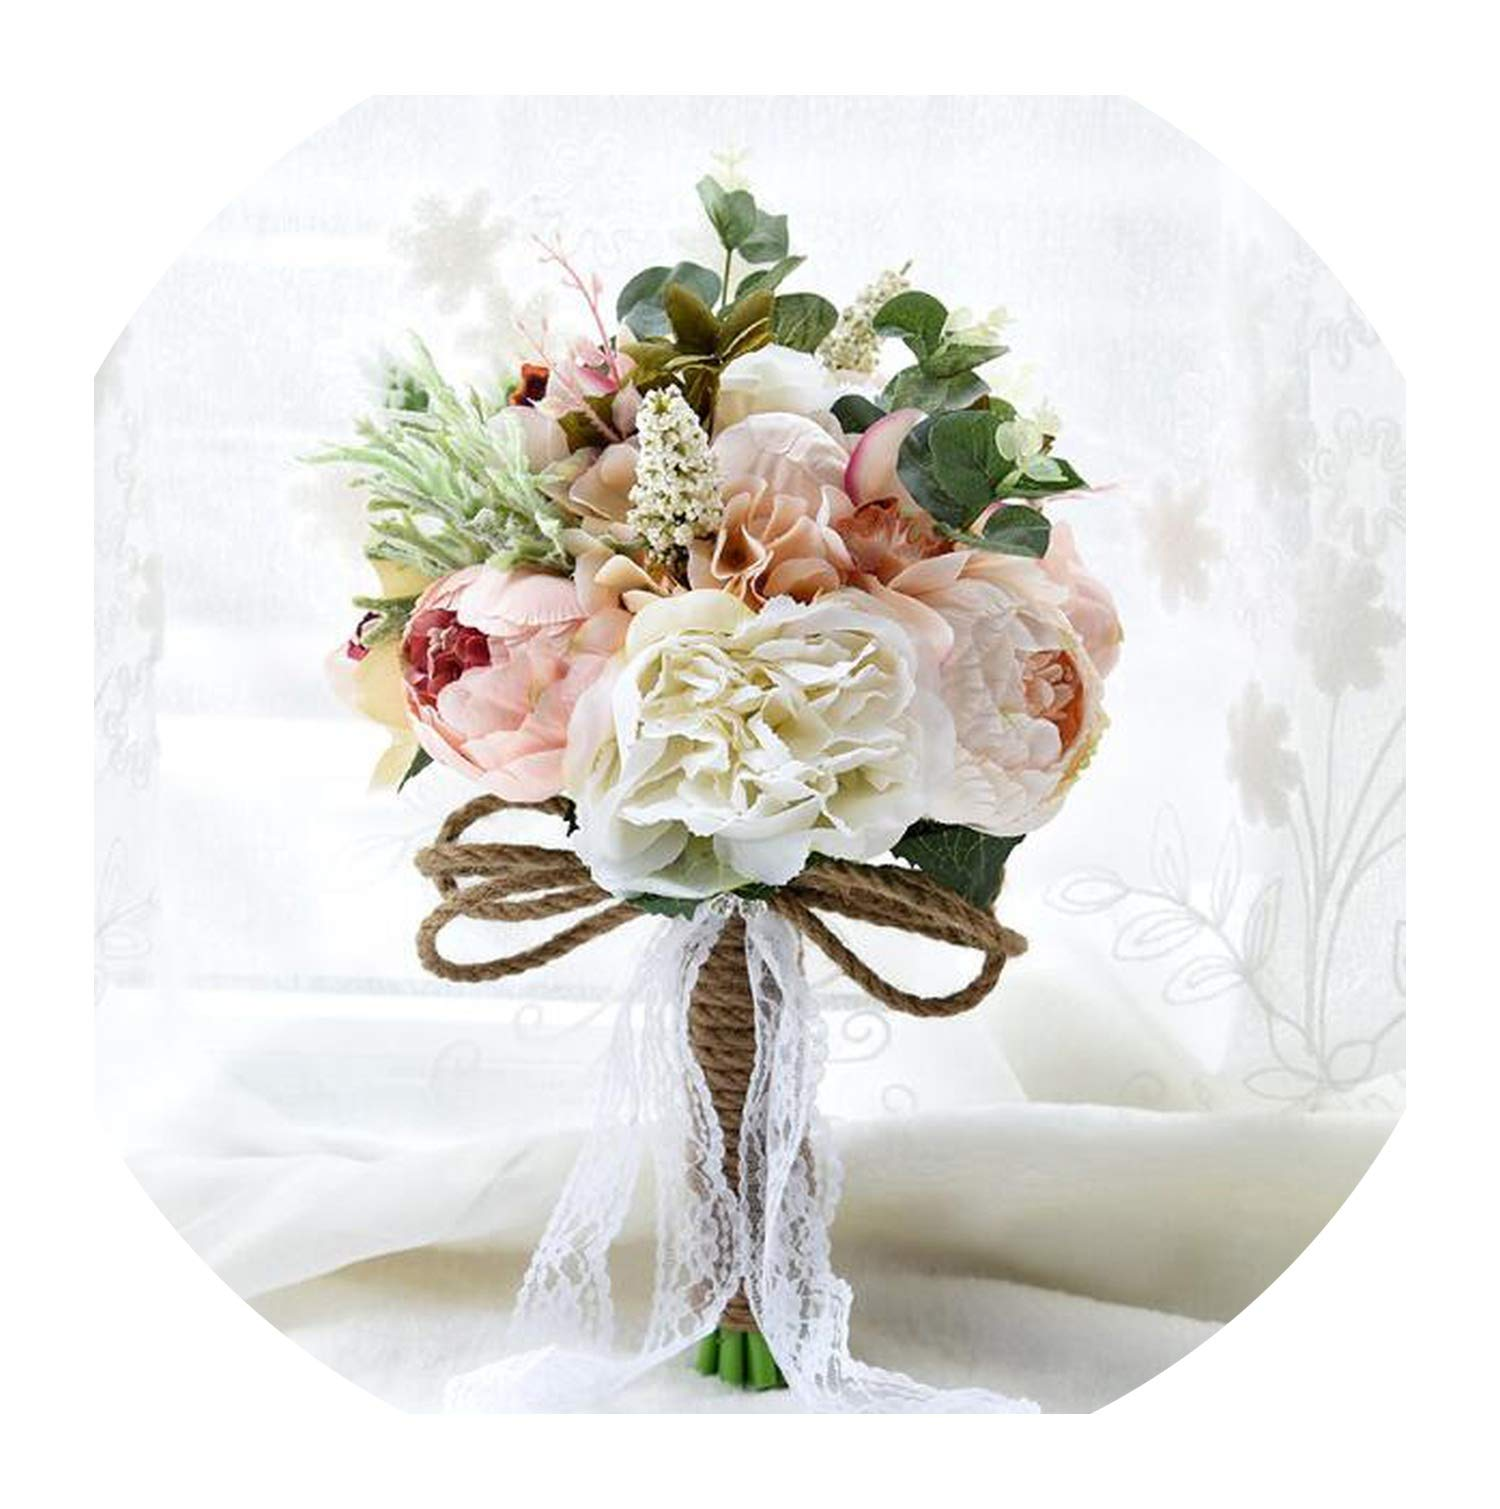 Artificial Flower Gorgeous flower Beautiful Bridal Wedding Bouquet Blue Creamy